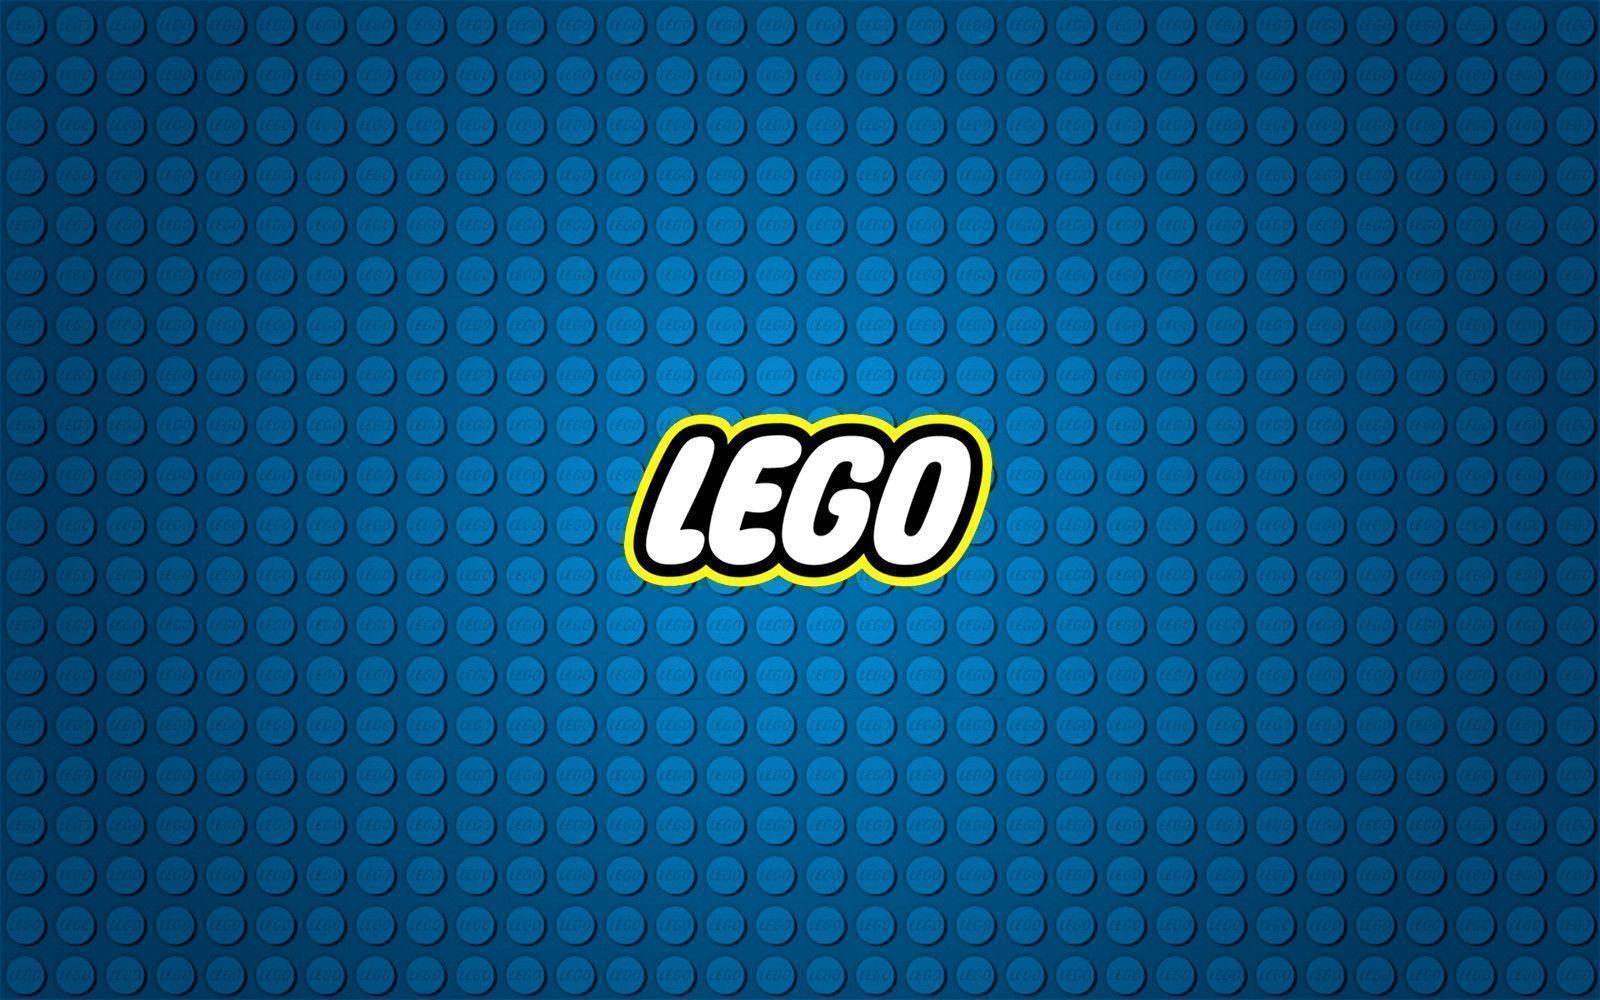 Lego Wallpaper 6539 1600x1000 px